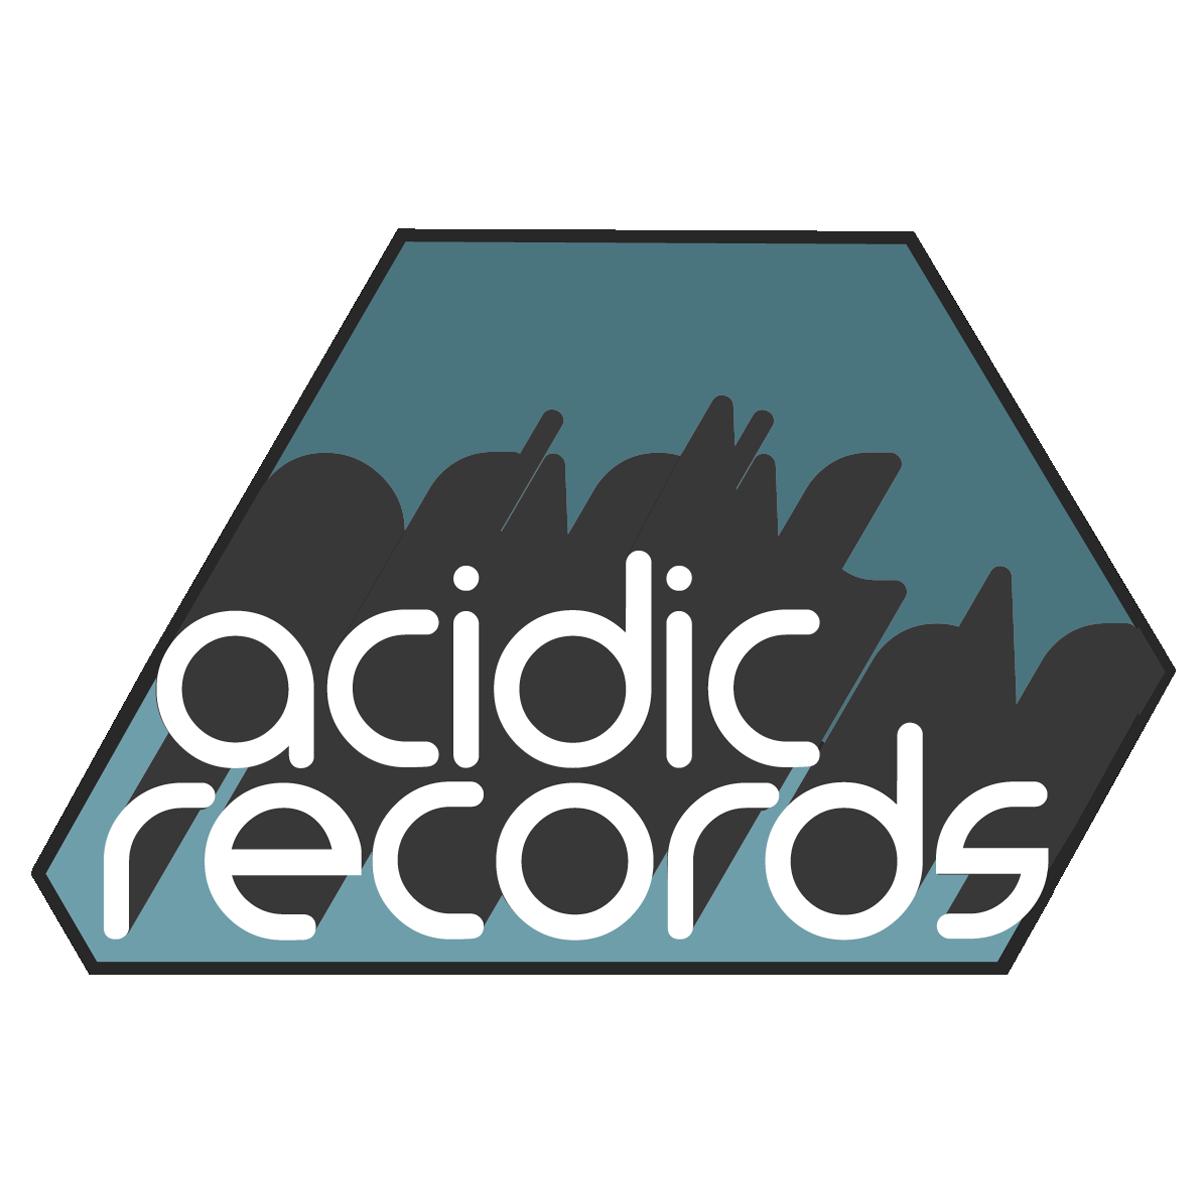 Acidic Records